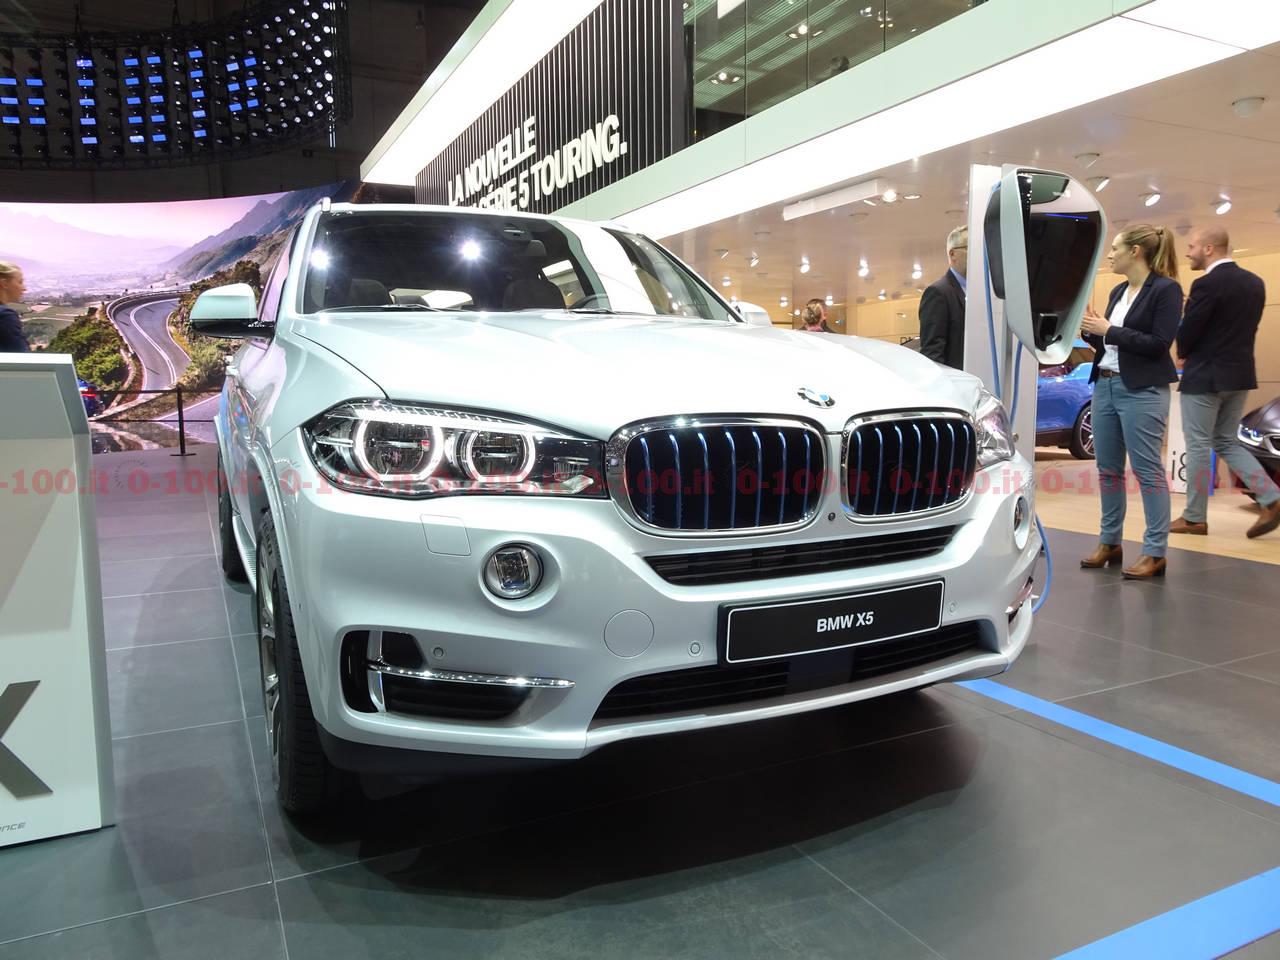 Ginevra-geneva-geneve-2017-BMW-x5-0-100_1